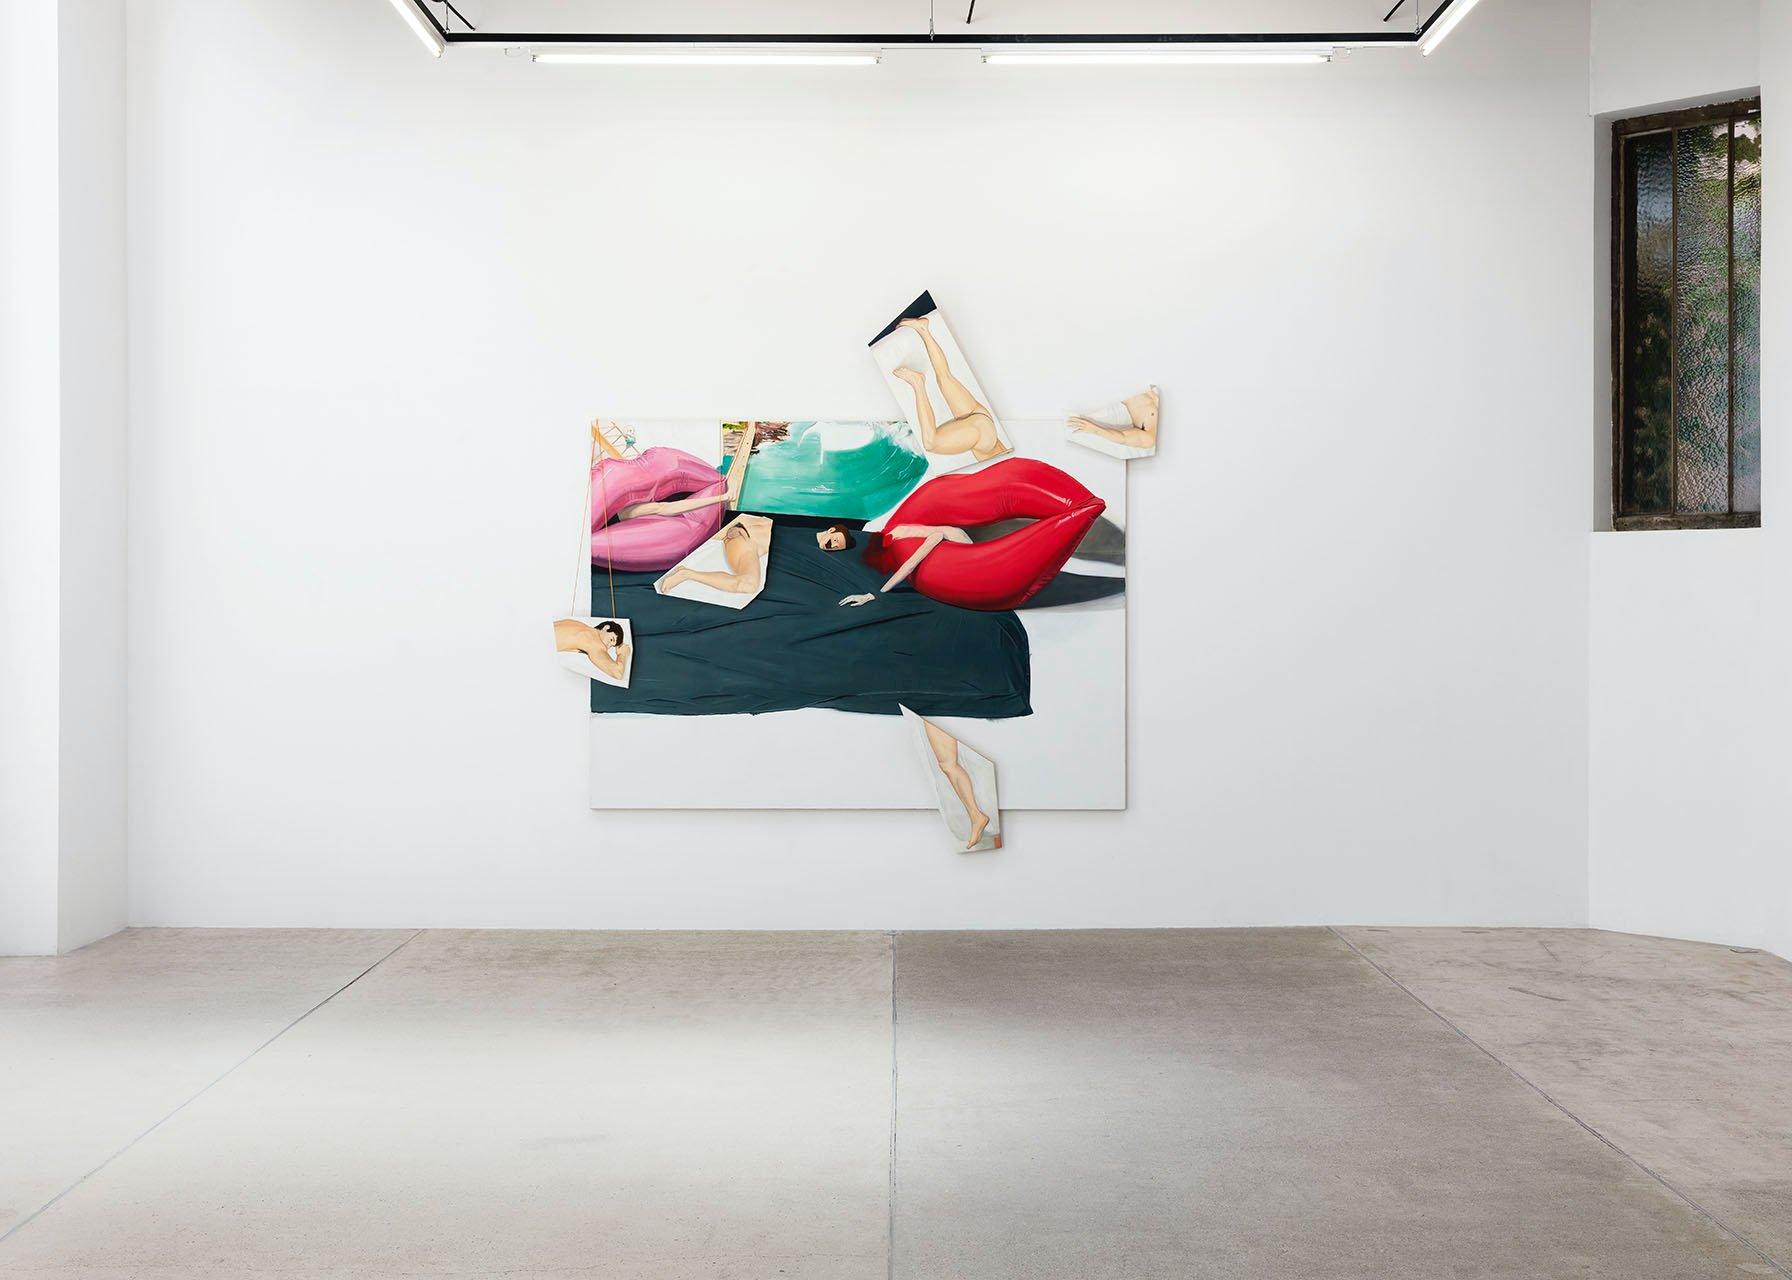 Galerie Frank Elbaz Leo Chesneau - Madeleine Roger-Lacan 1